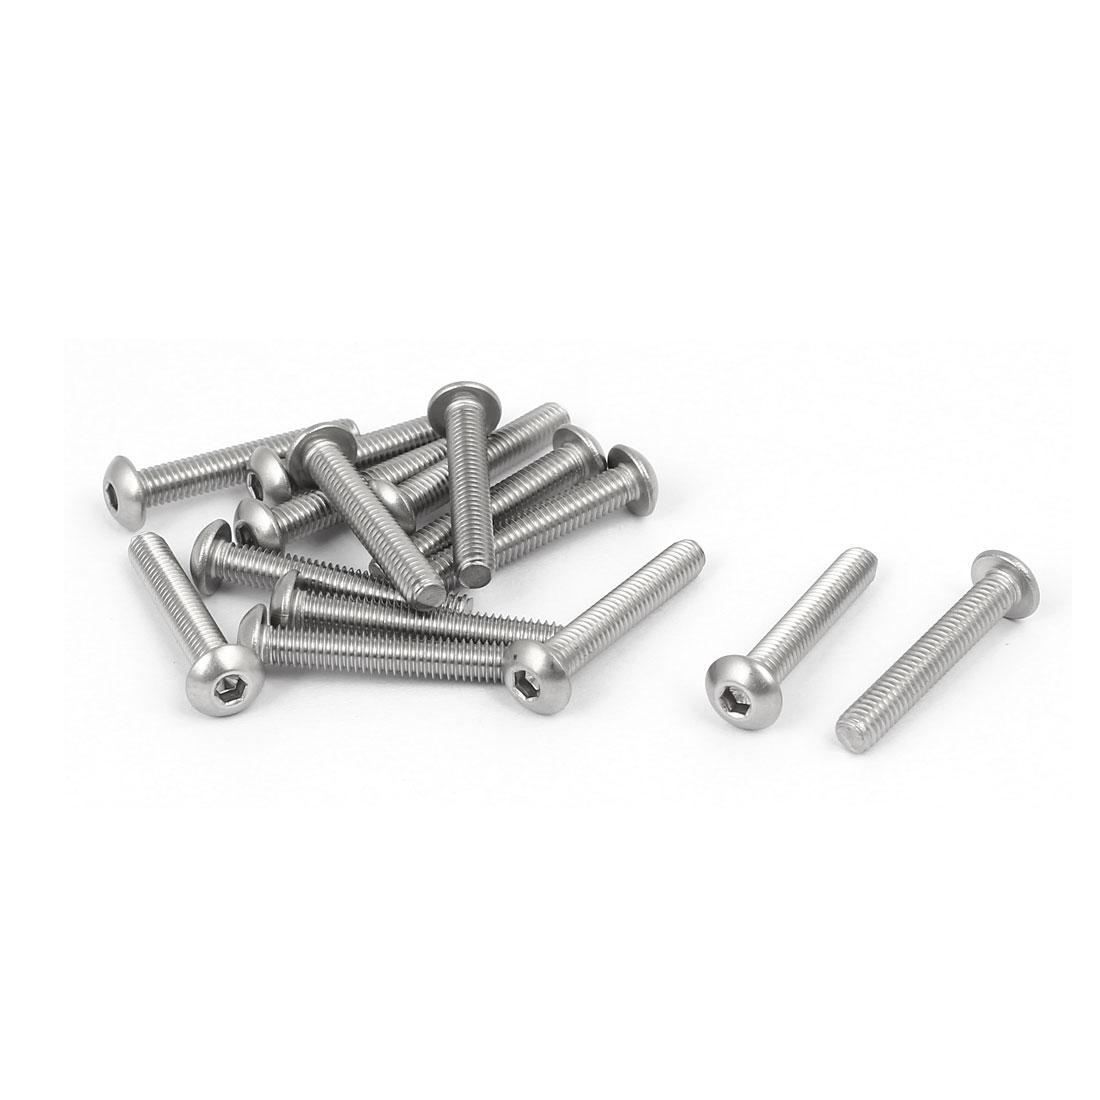 M4x25mm 316 Stainless Steel Round Button Head Hex Socket Cap Screw Bolt 15pcs